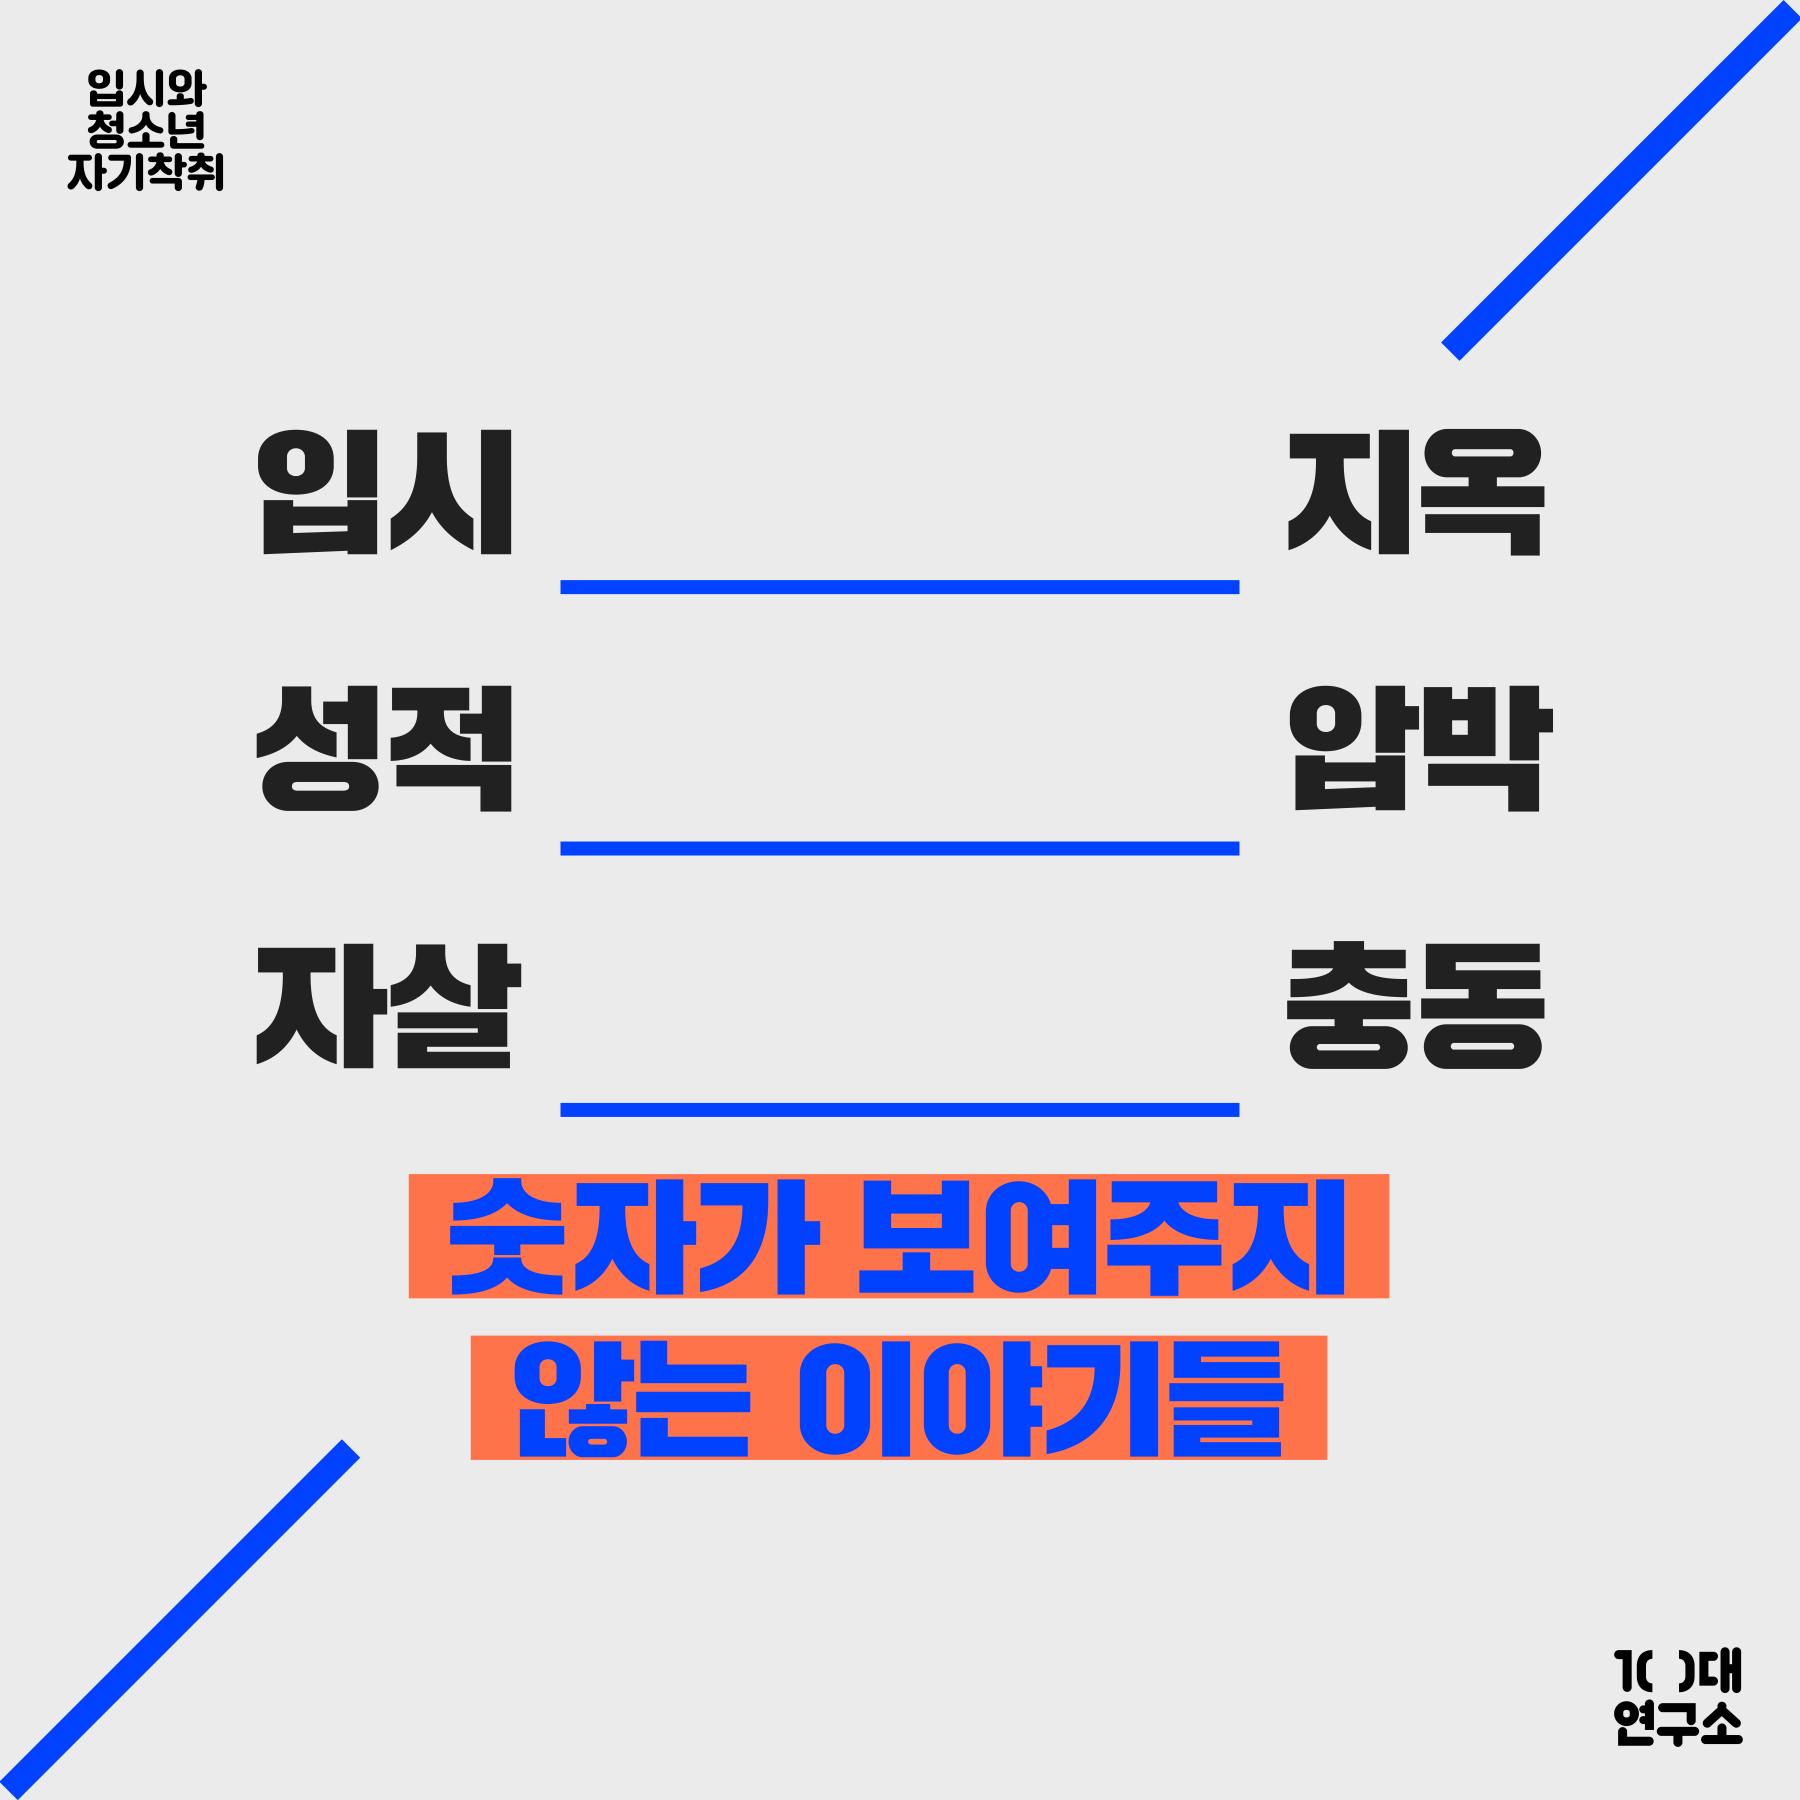 A_입시와 청소년 자기착취_8.png